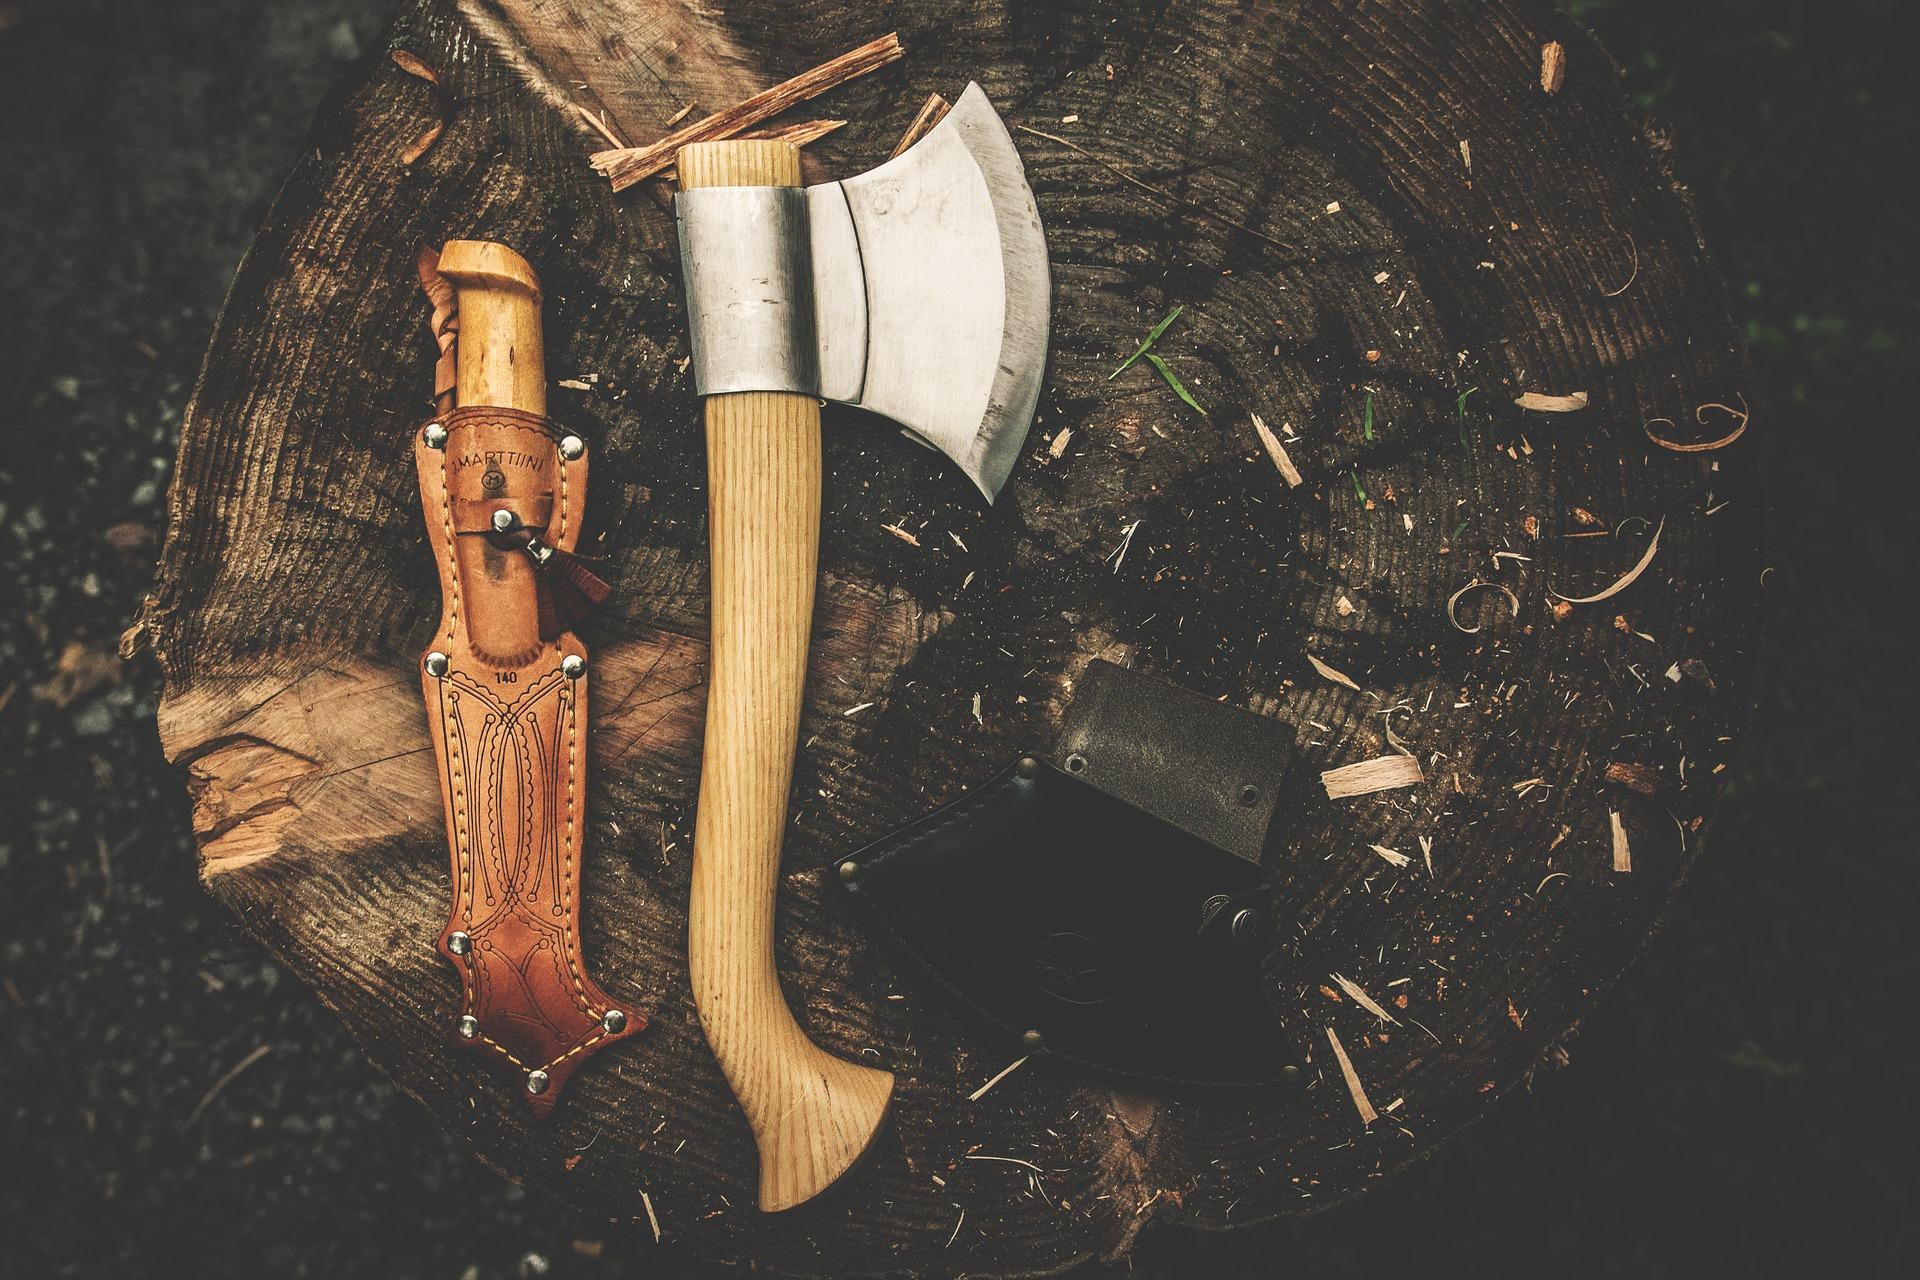 Best Survival Knife – Prepper's Guide to Choosing the Best Knife